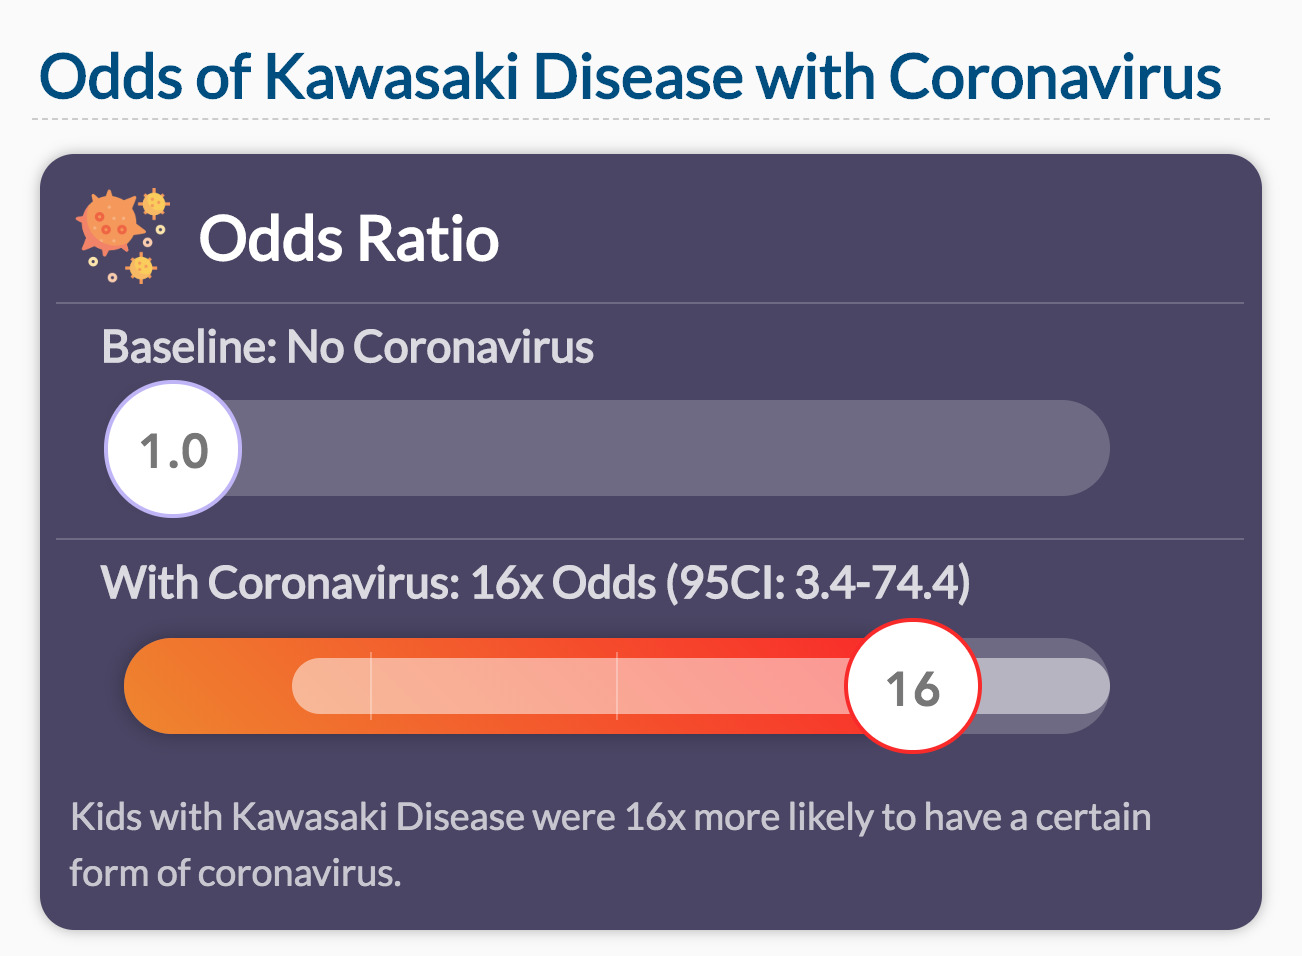 Odds of Kawasaki Disease with Coronavirus